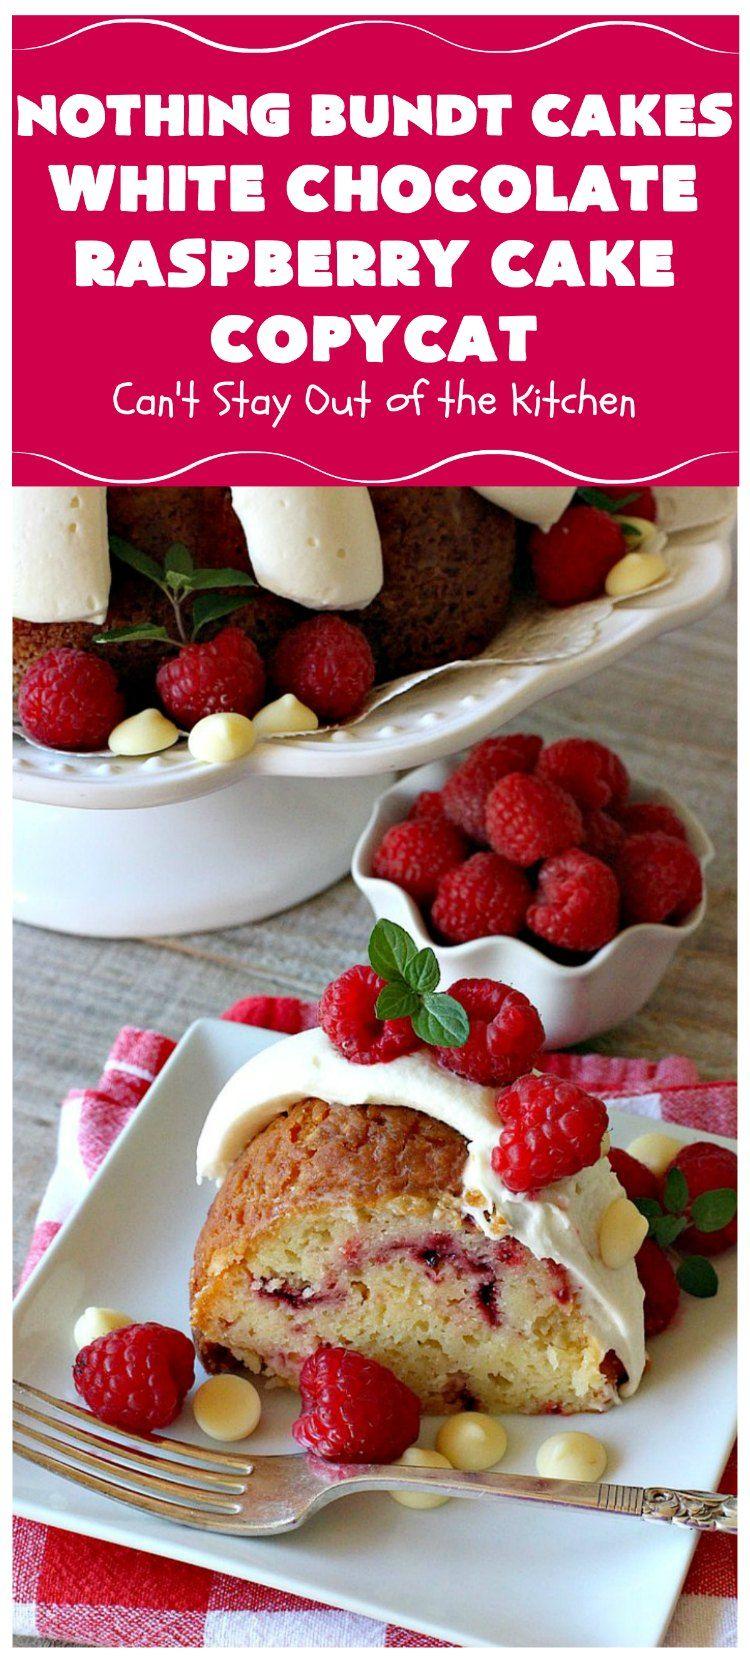 Nothing bundt cakes white chocolate raspberry cake copycat